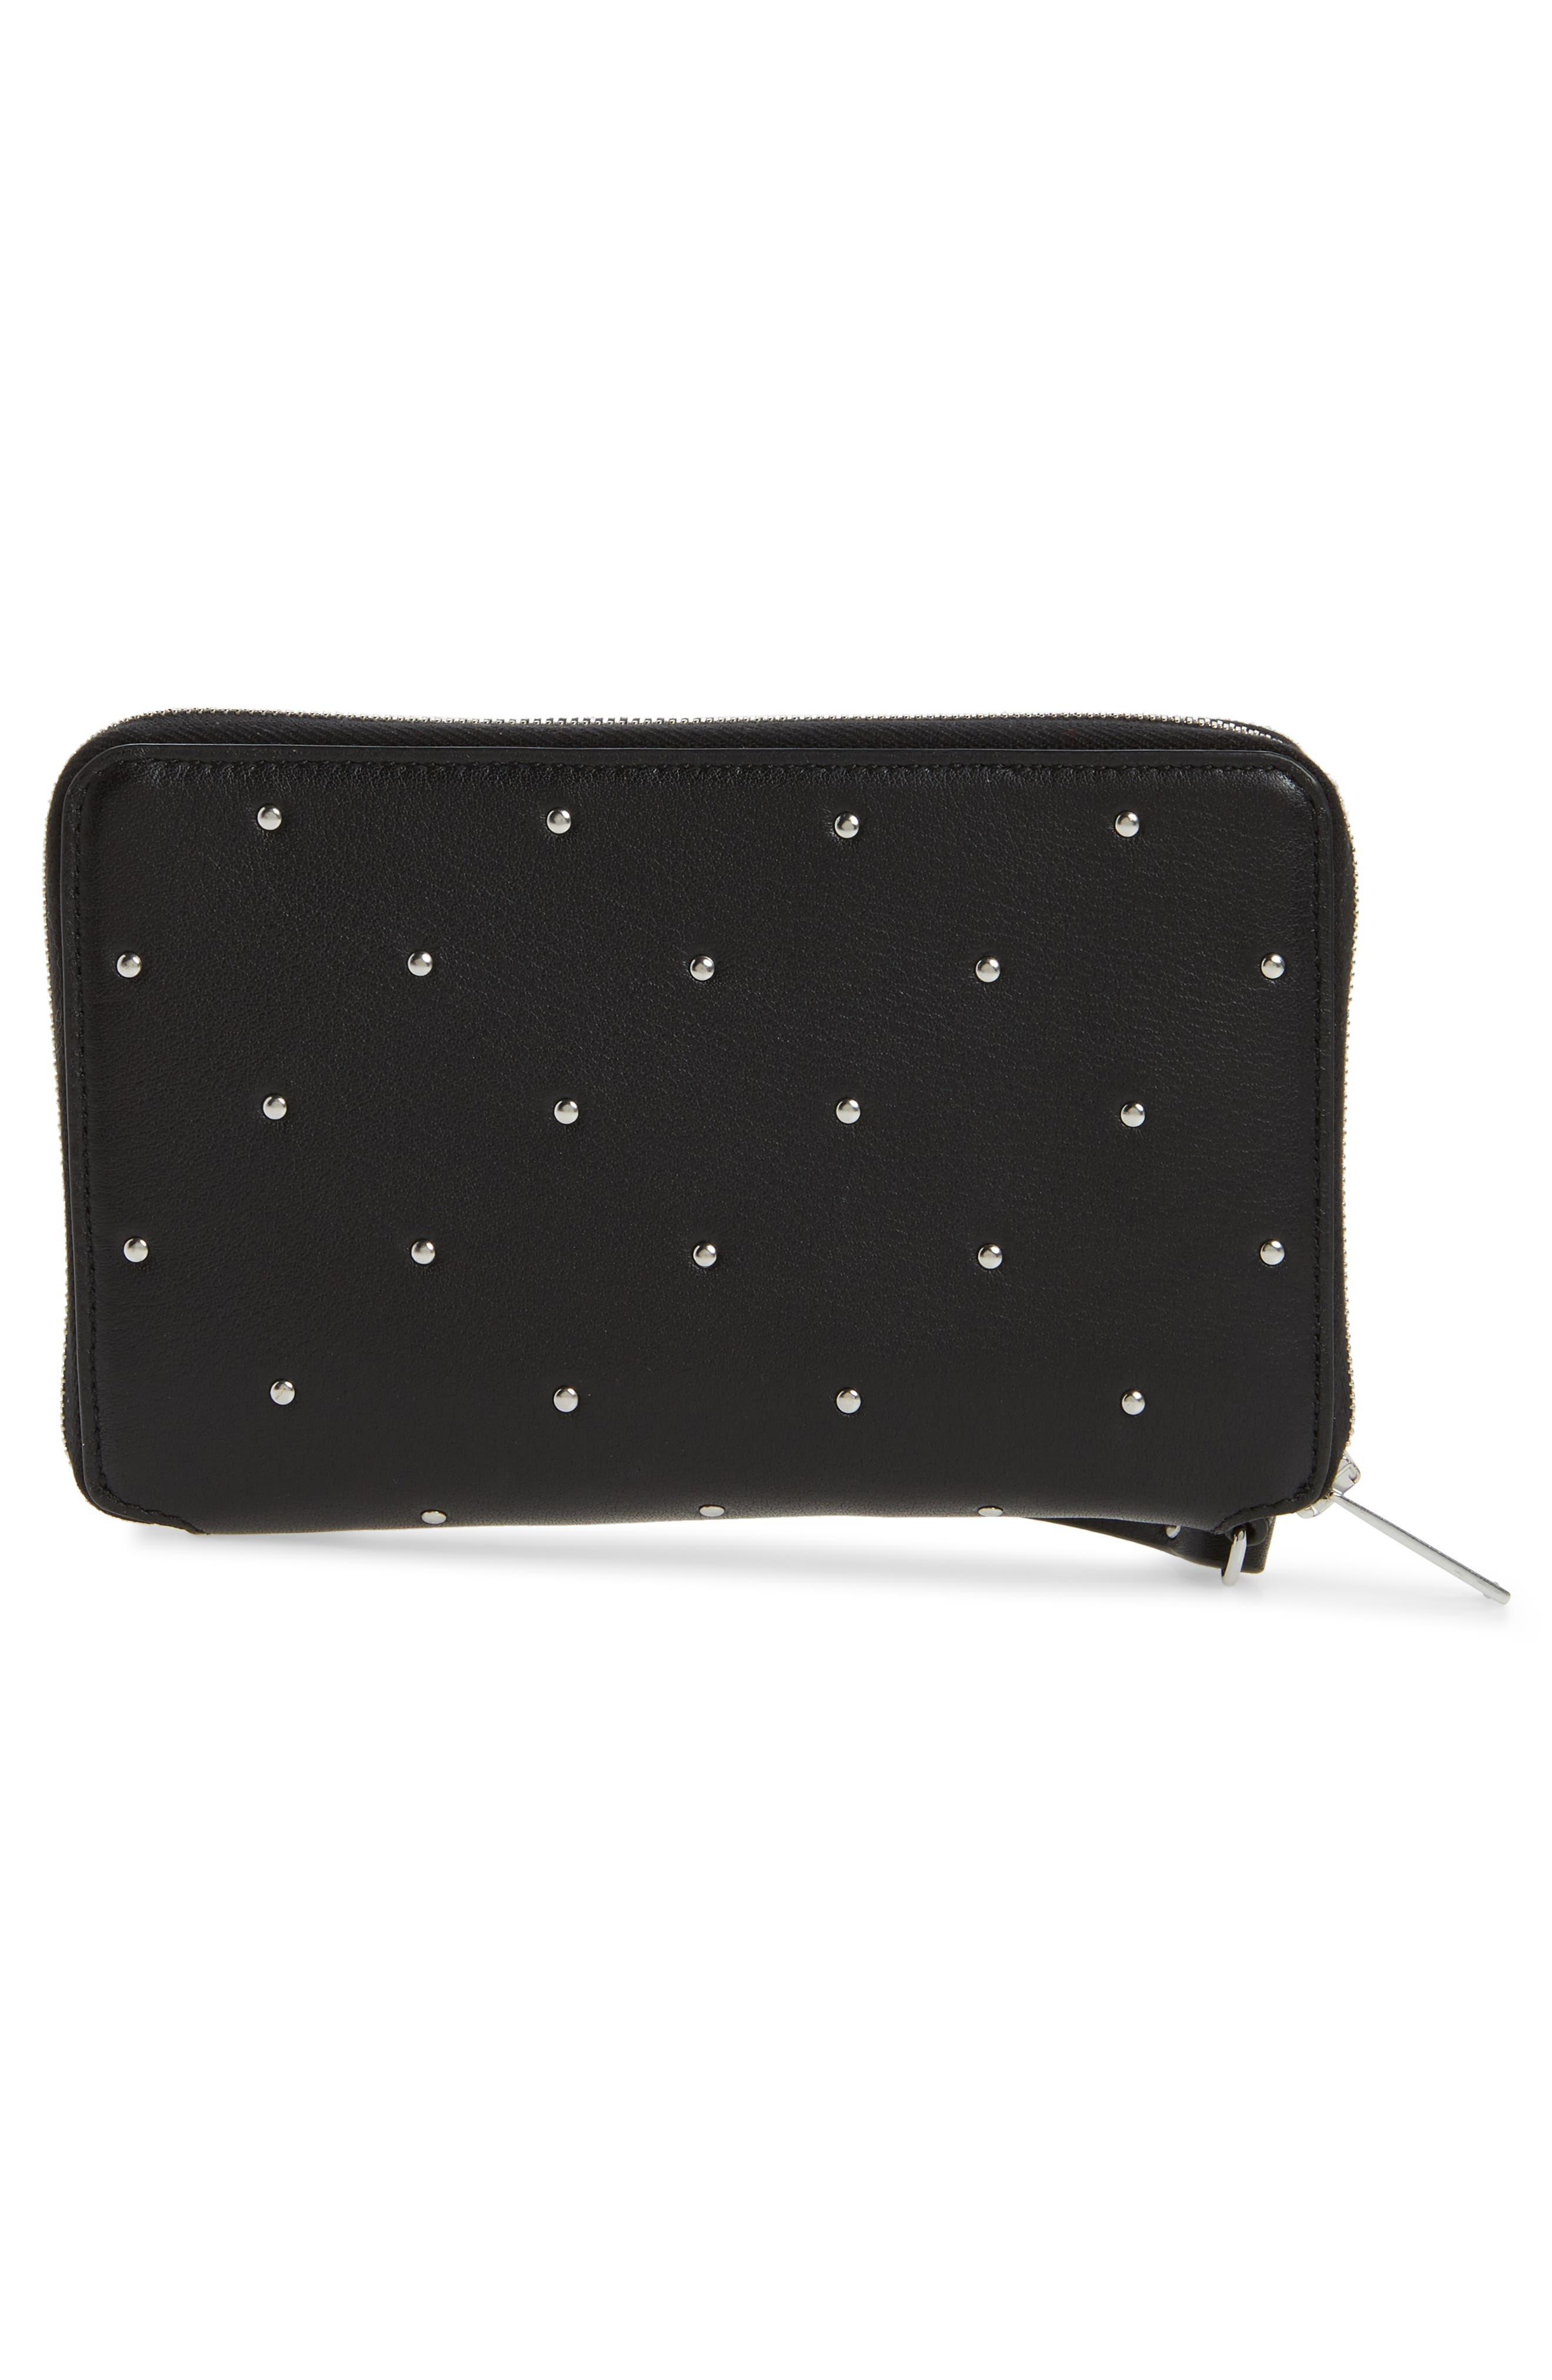 Studded Leather Smartphone Wallet,                             Alternate thumbnail 4, color,                             Black Studs